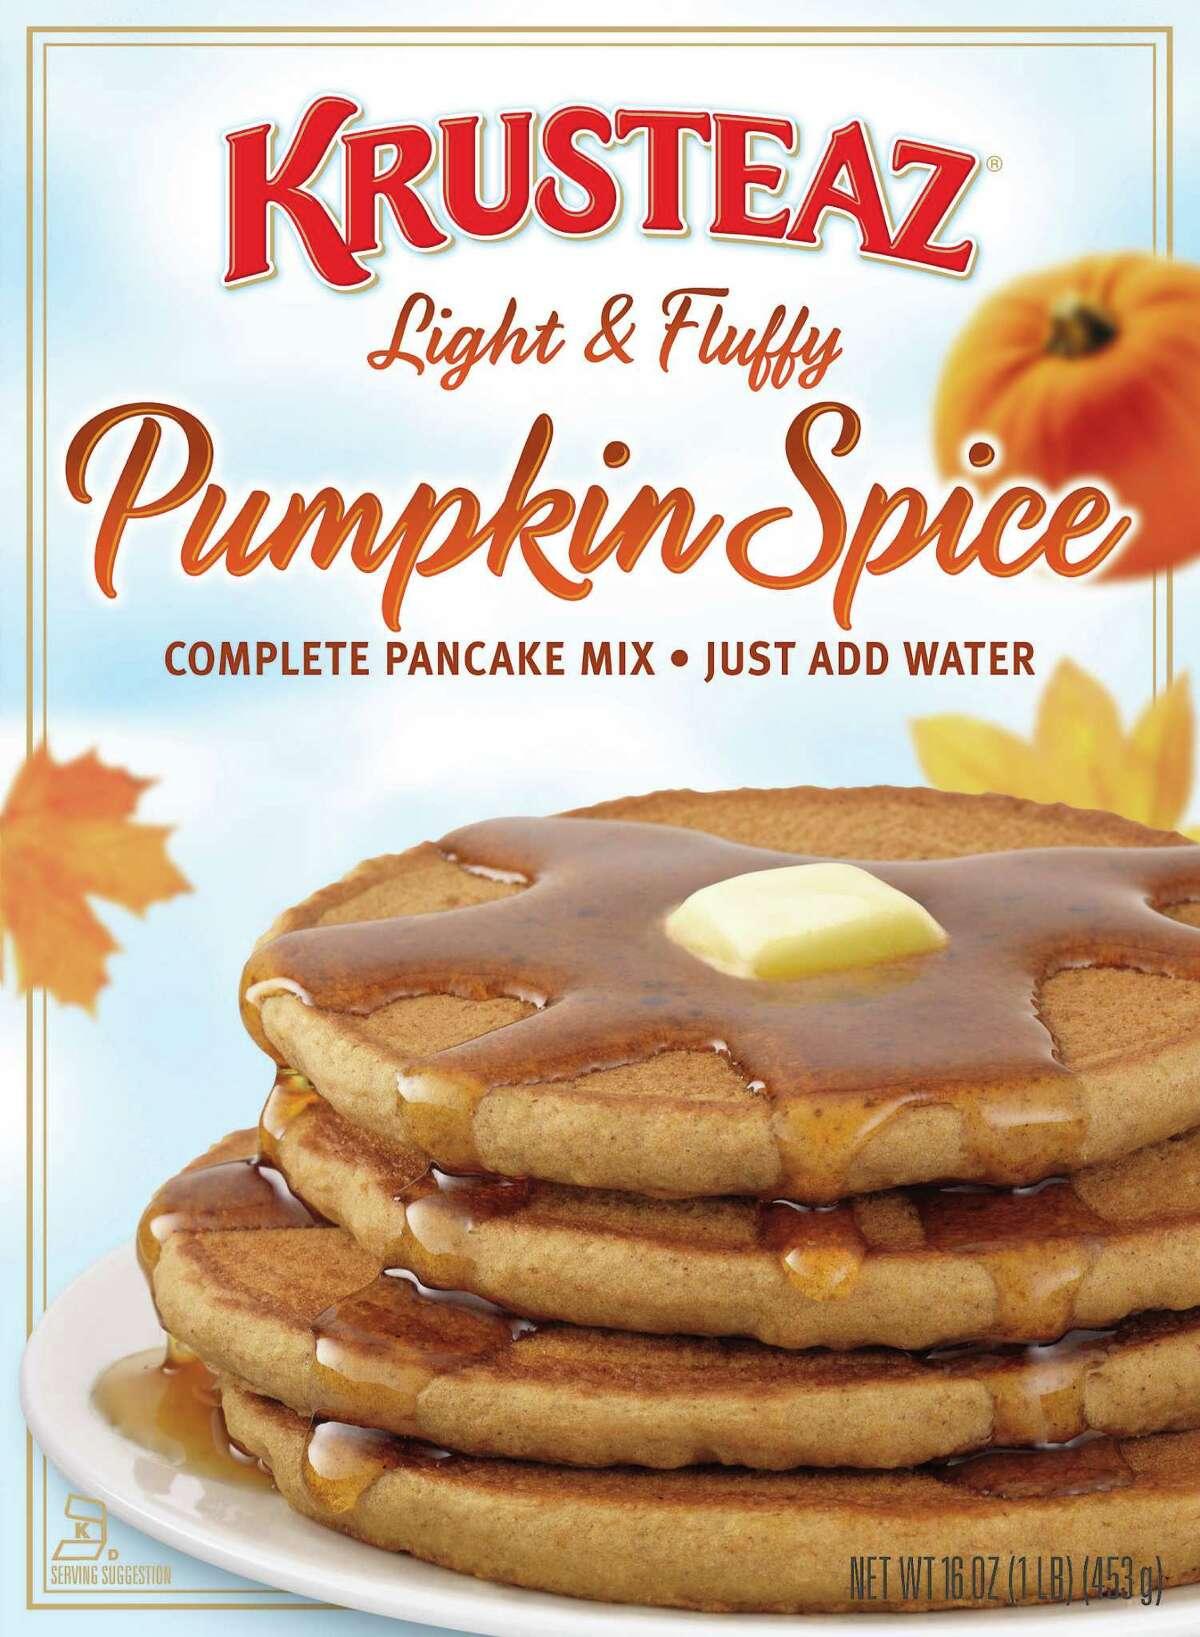 Krusteaz, which makes baking and pancake mixes, offers several seasonal mixes: Pumpkin Quick Bread, Pumpkin Pie Bar, Pumpkin Spice Muffins and Pumpkin Spice Pancakes.